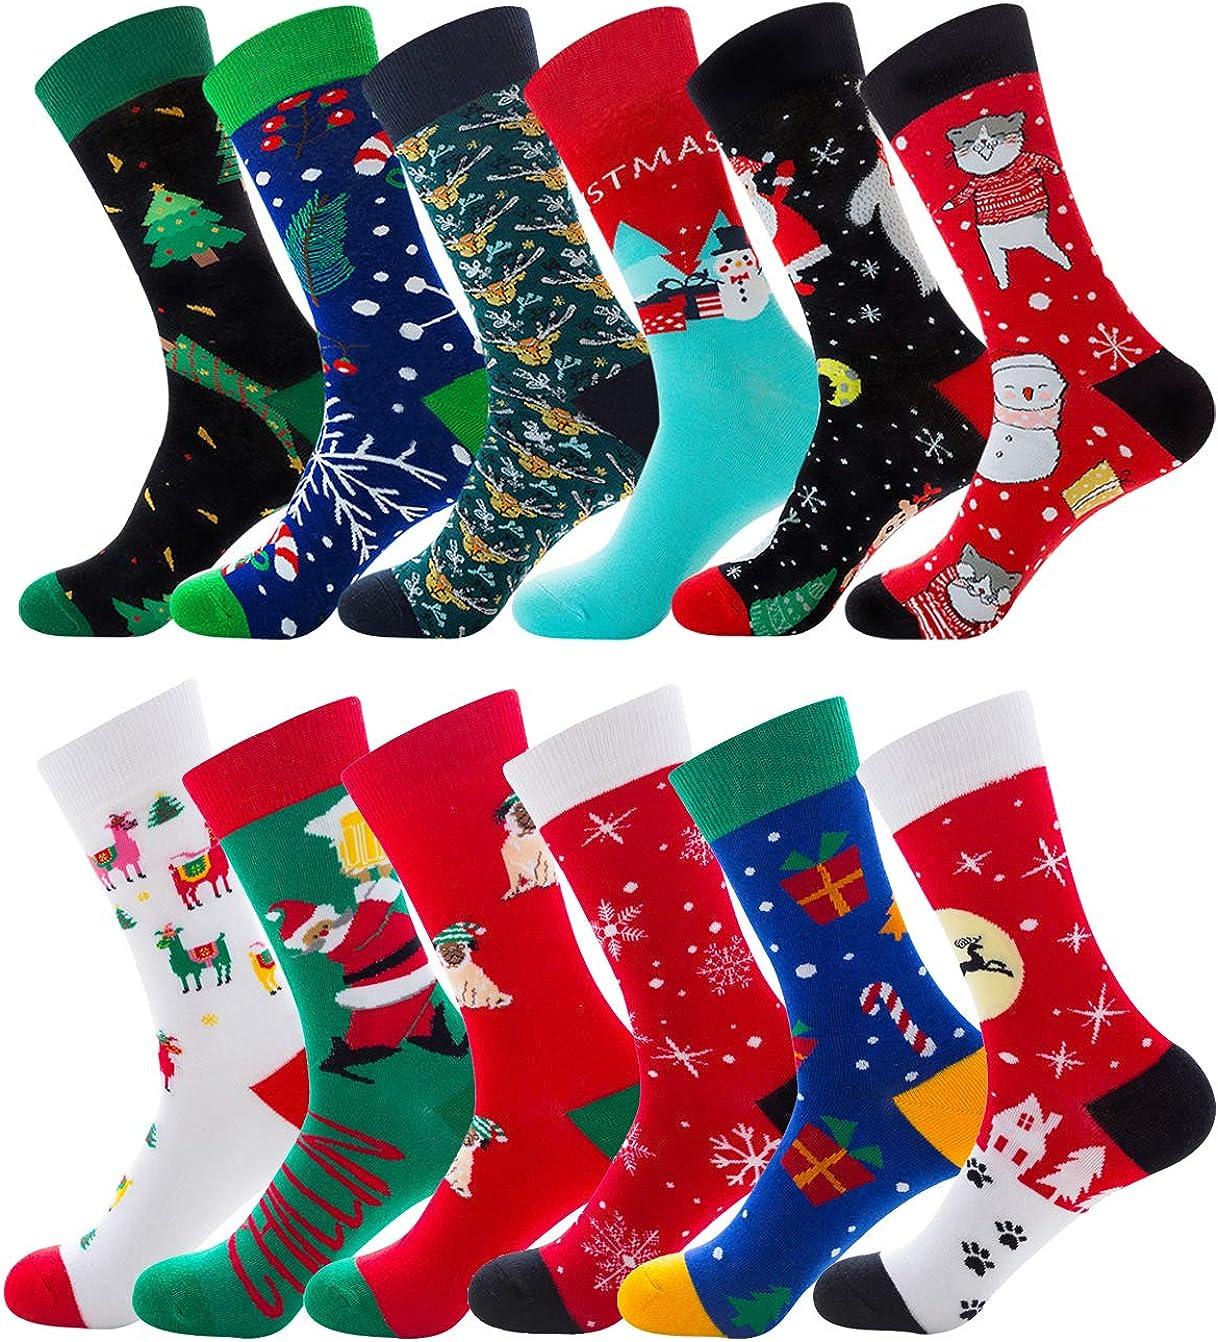 Men's Women's Christmas Holiday Fun Dress Socks Funny Gifts Cute Novelty Cotton Mid Calf Crew Large Socks